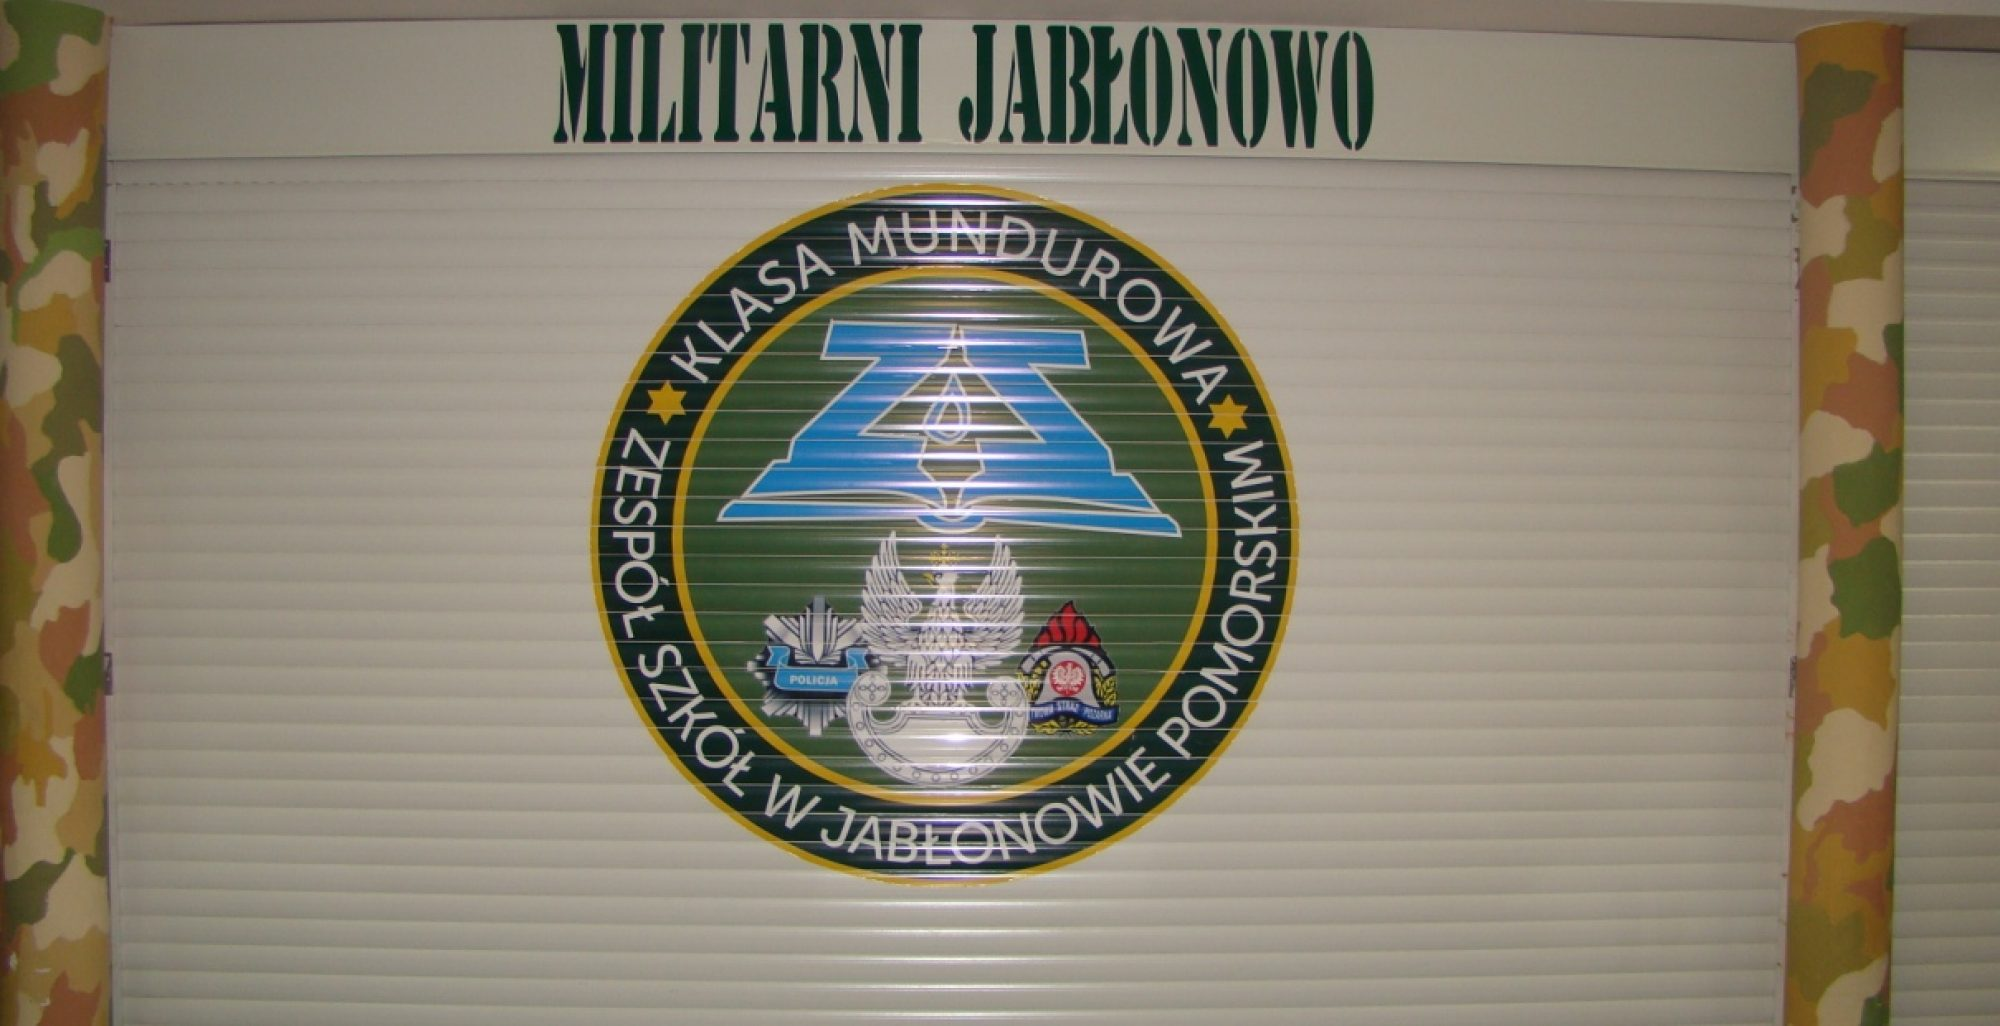 Militarni Jabłonowo